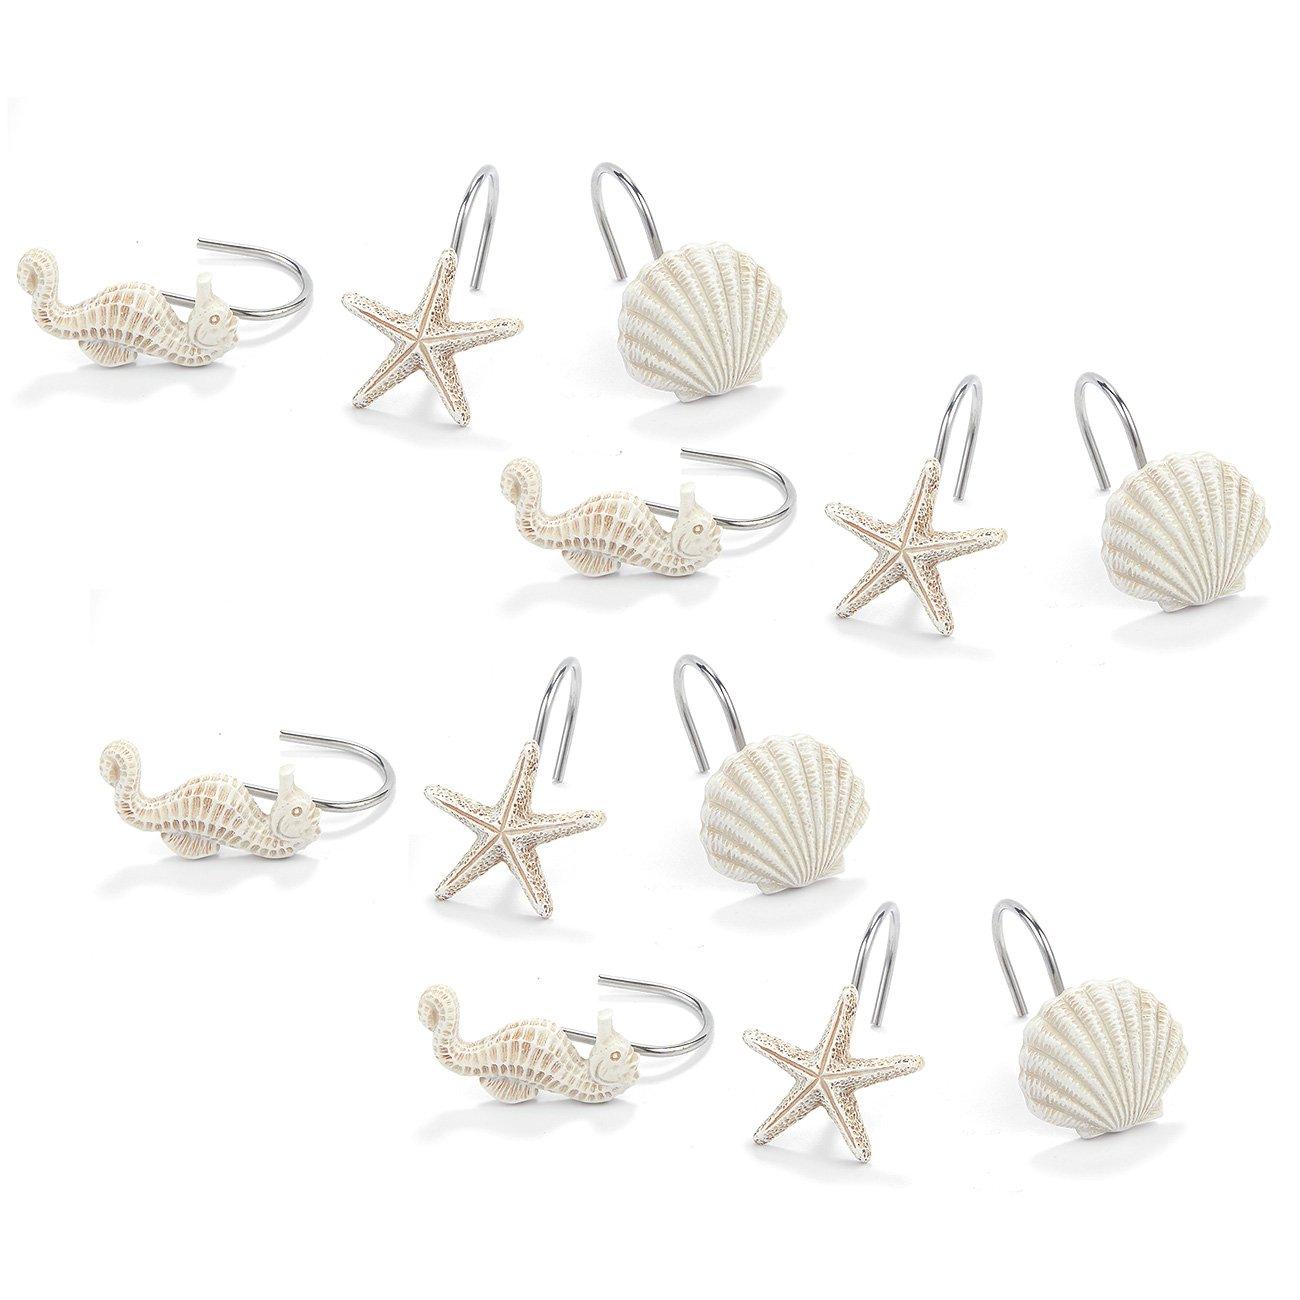 Juvale Seashell Shower Curtain Hooks - 12-Pieces Decorative Bath Curtain Rings for Beach, Mermaid, Ocean-Themed Bathroom - Seahorse, Seashell, Starfish Designs, White